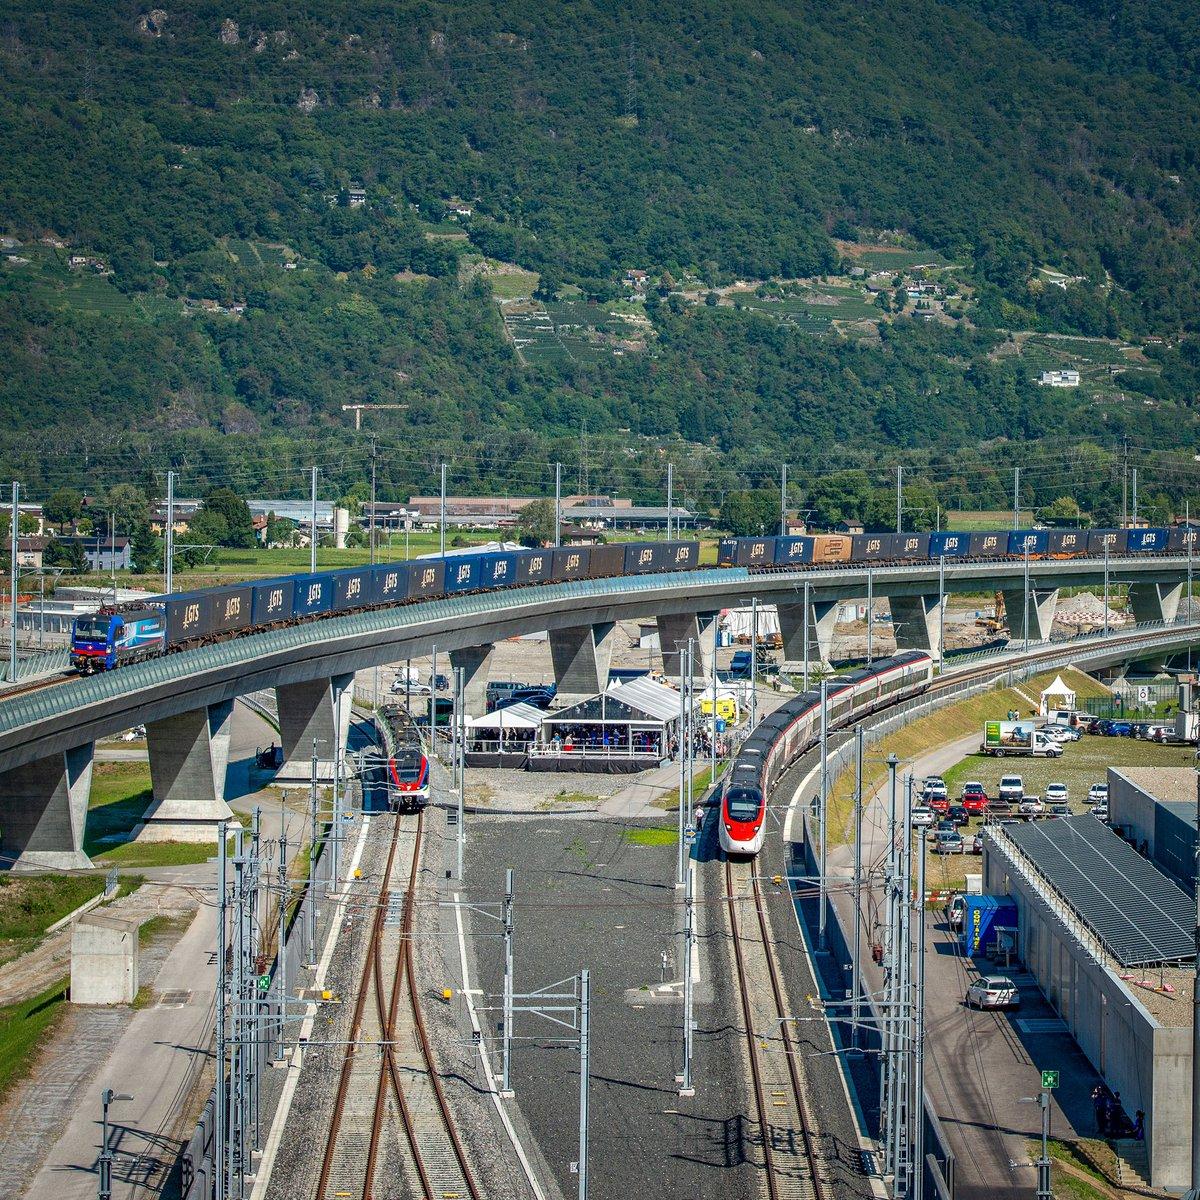 Der Ceneri-Basistunnel ist eröffnet! Viva il treno, viva il Ticino, viva la Svizzera! #ceneri2020 https://t.co/qUjgwhkEWW